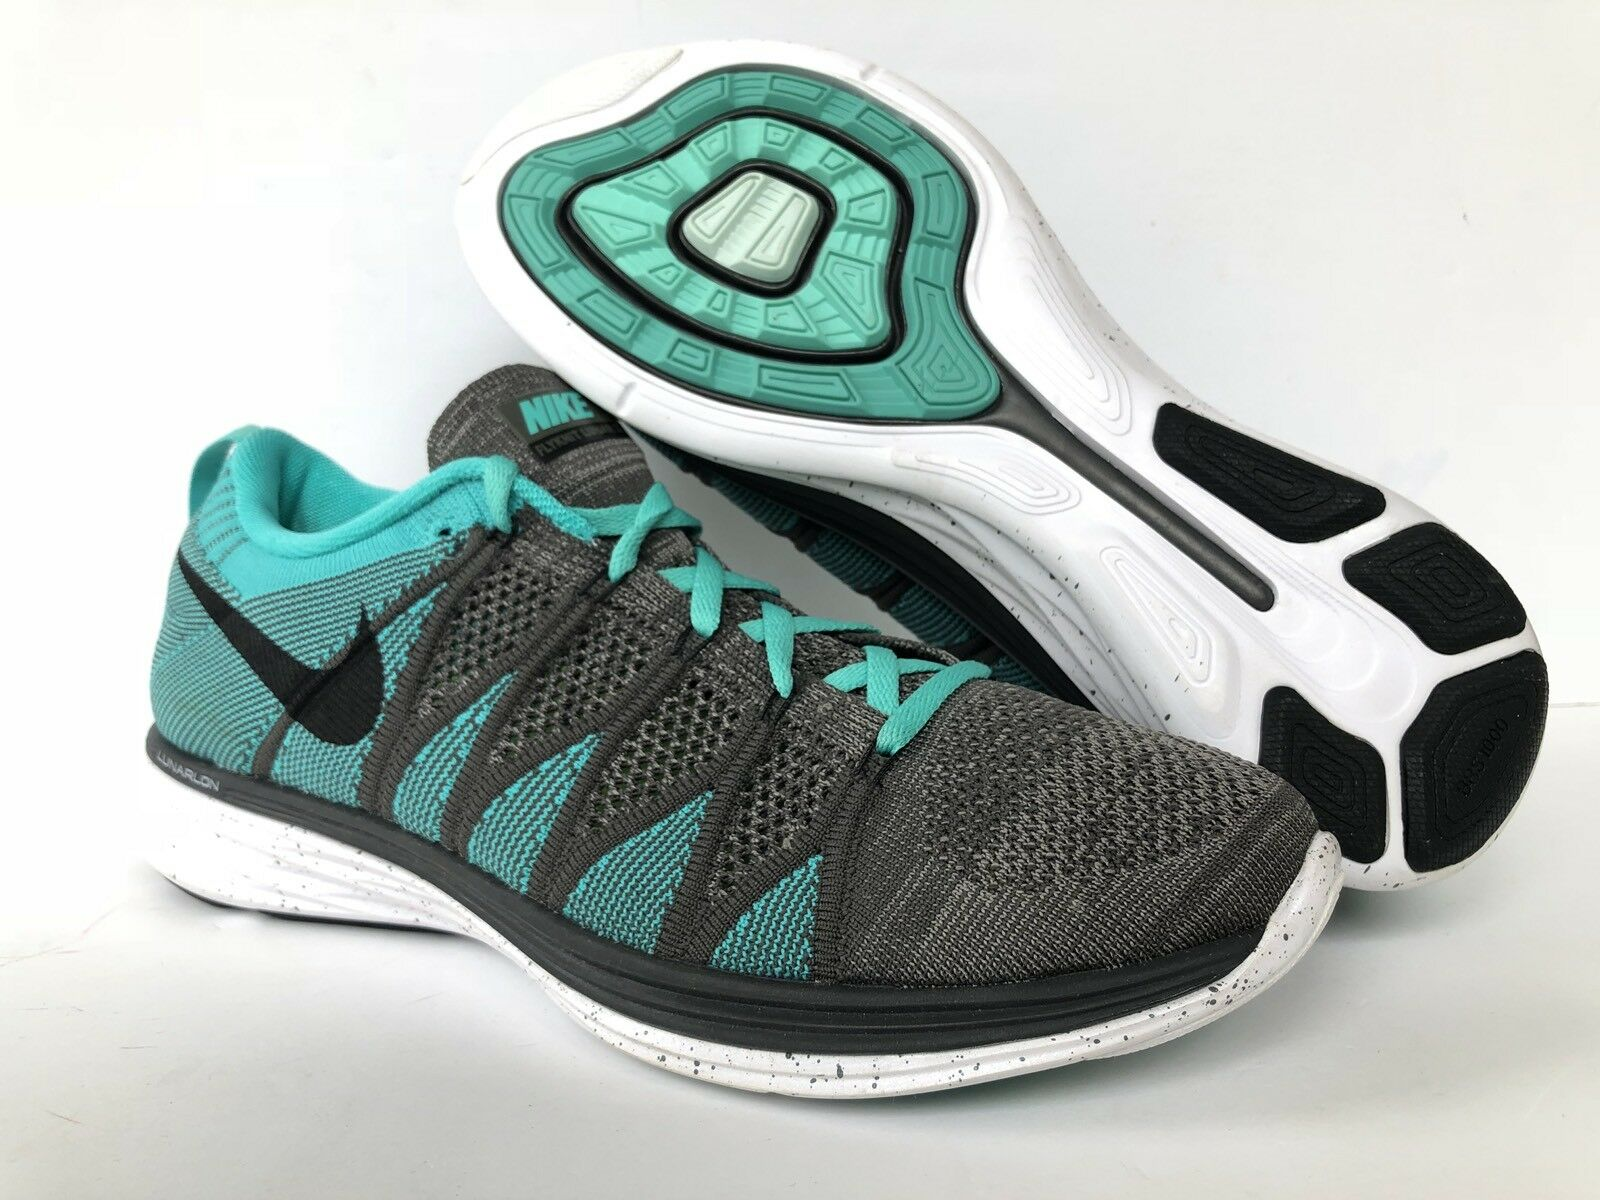 Nike SZ Lunar nos muestra Flyknit 2 hombres SZ Nike 10 Teal / gris a0e22c